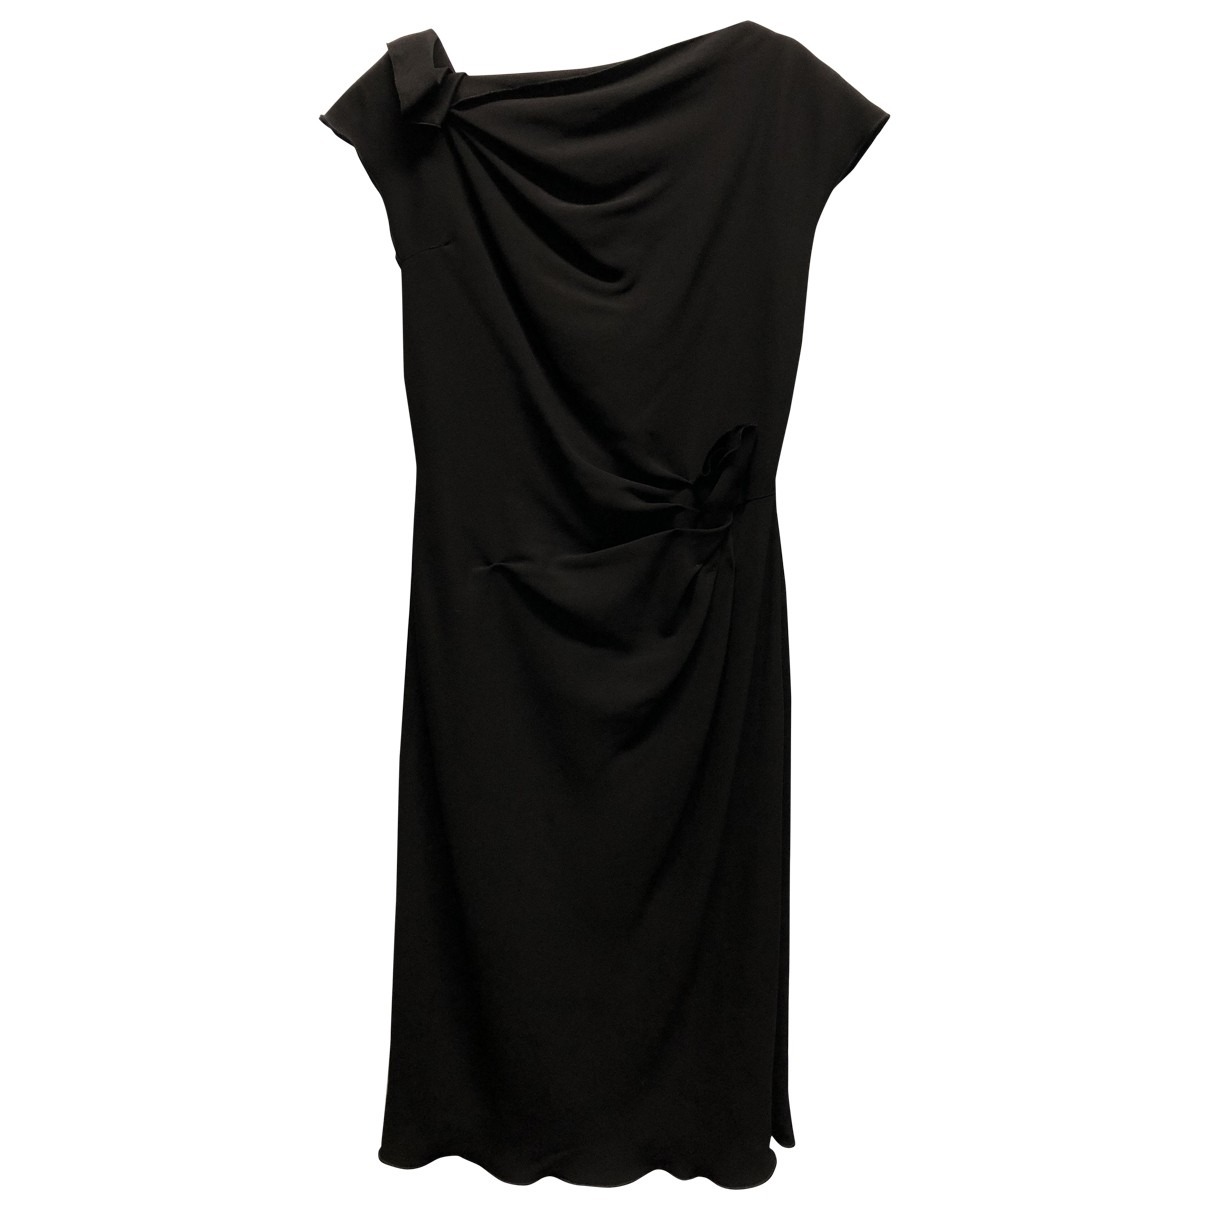 Prada \N Black dress for Women 46 IT